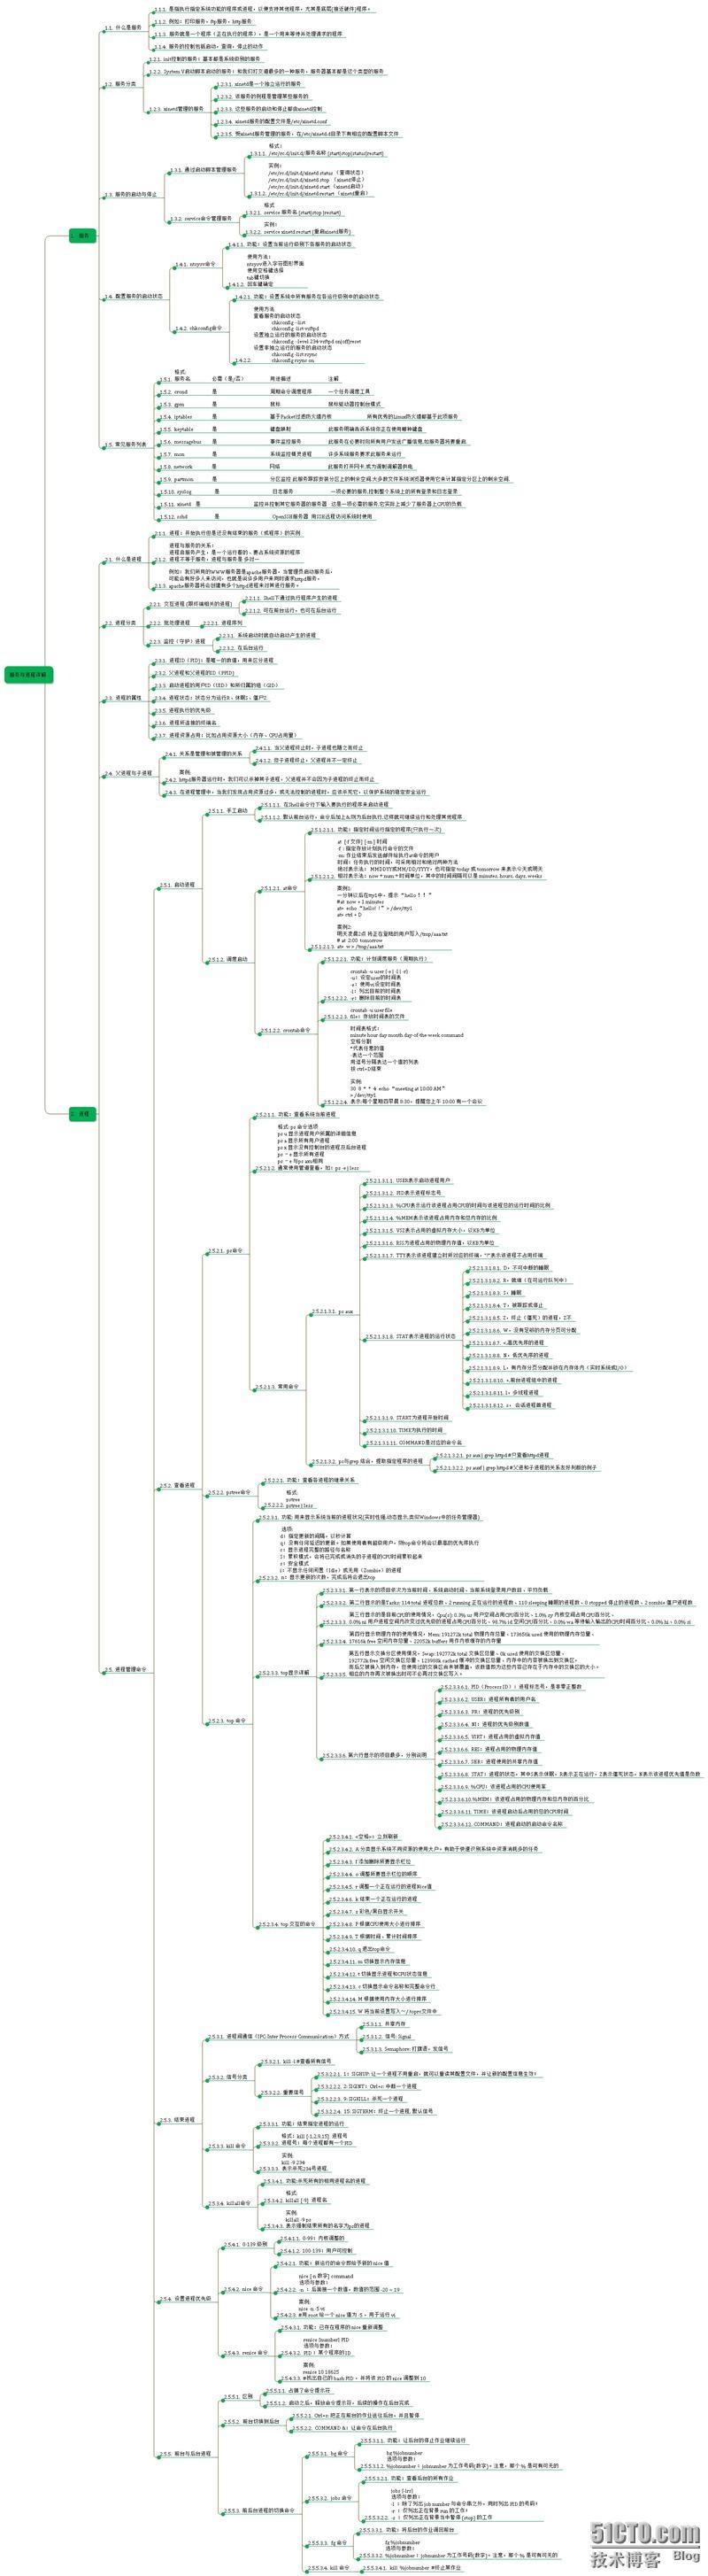 5. Linux 服务与进程管理详解